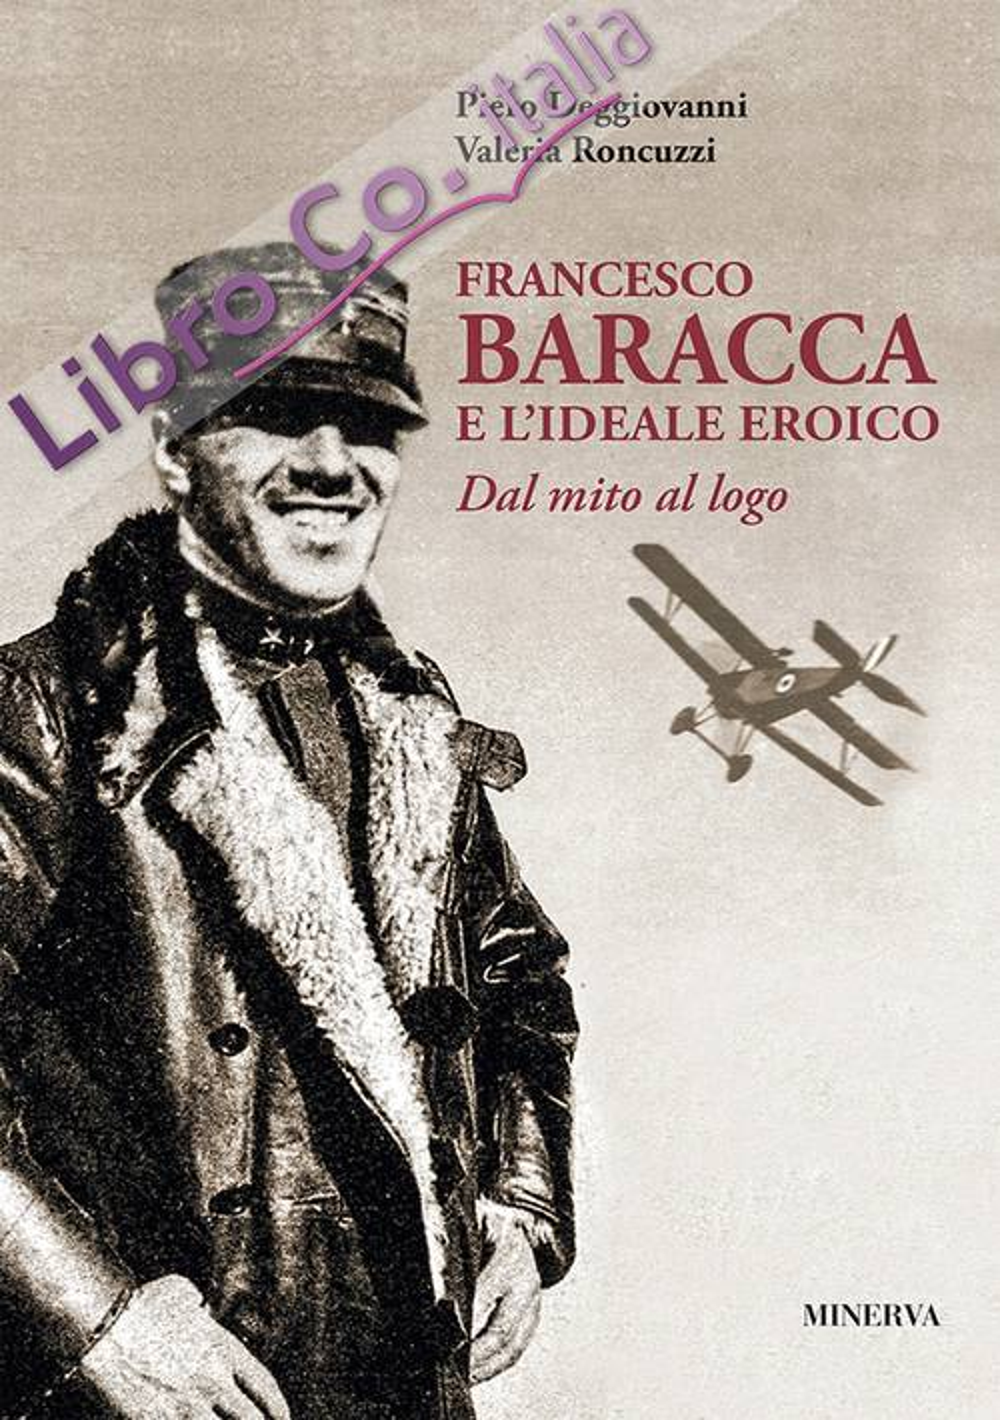 Francesco Baracca e l'ideale eroico. Dal mito al logo